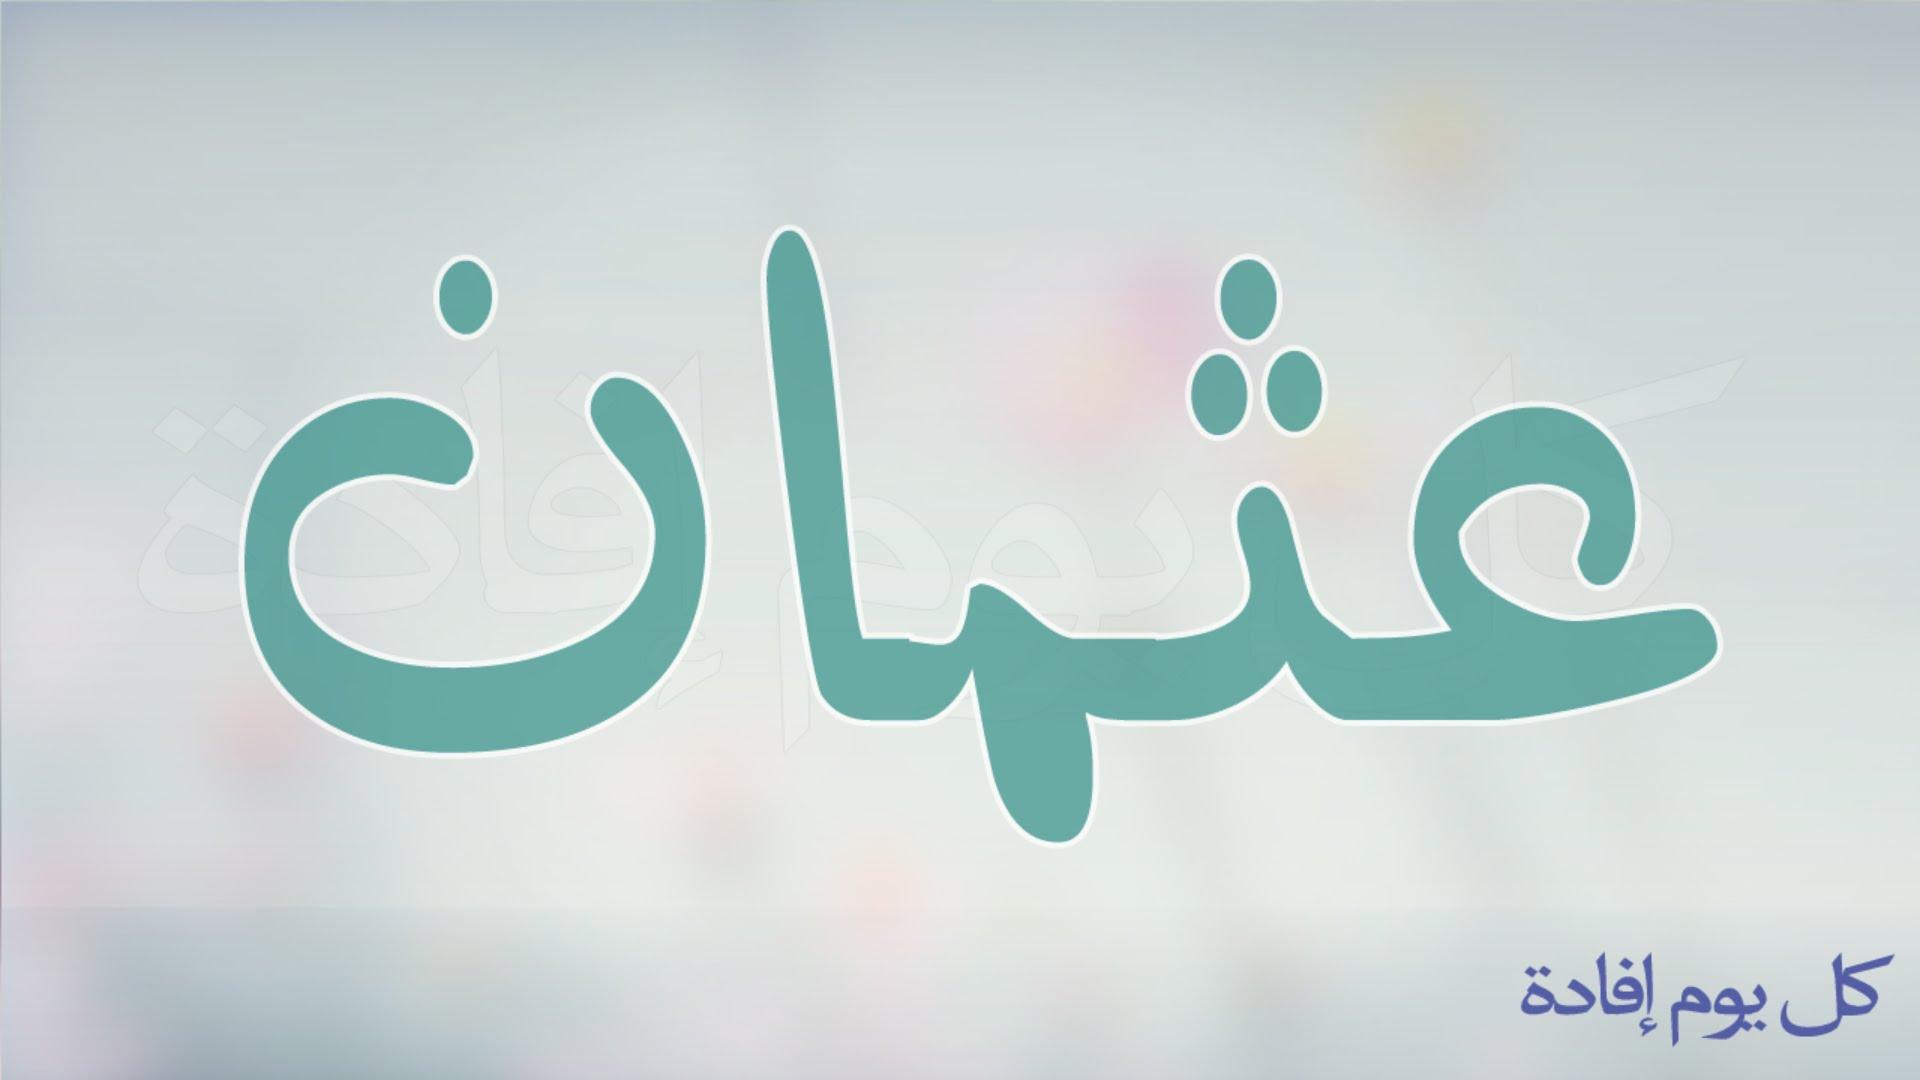 صور معنى اسم عثمان , تفسير اسم عثمان